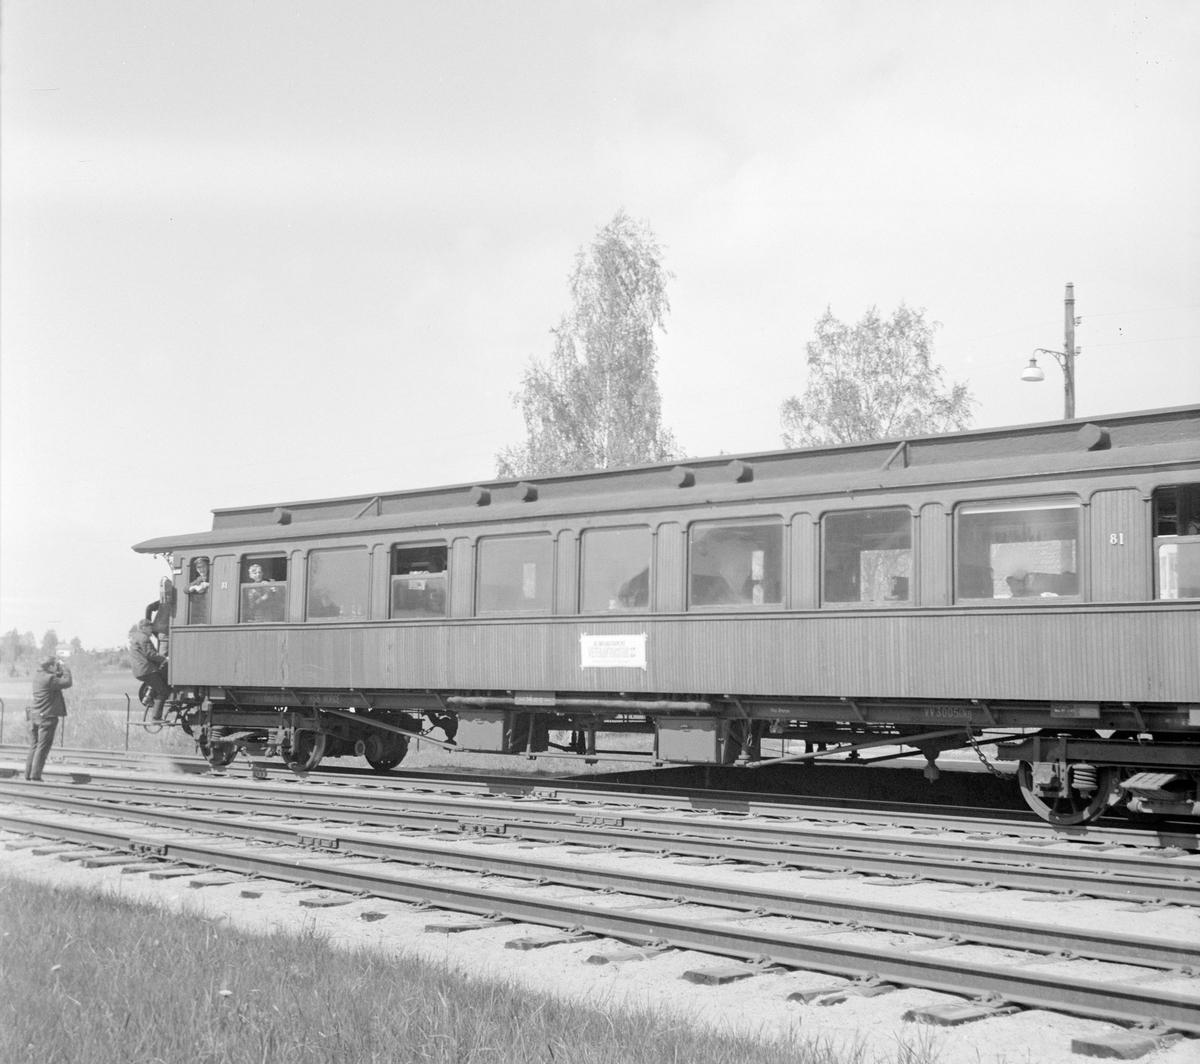 Veterantogtur på Solørbanen for A/L Hølandsbanen og Svenska Järnvägsklubben. Vogn Bo3b nr. 81 var reservert for A/L Hølandsbanenen.